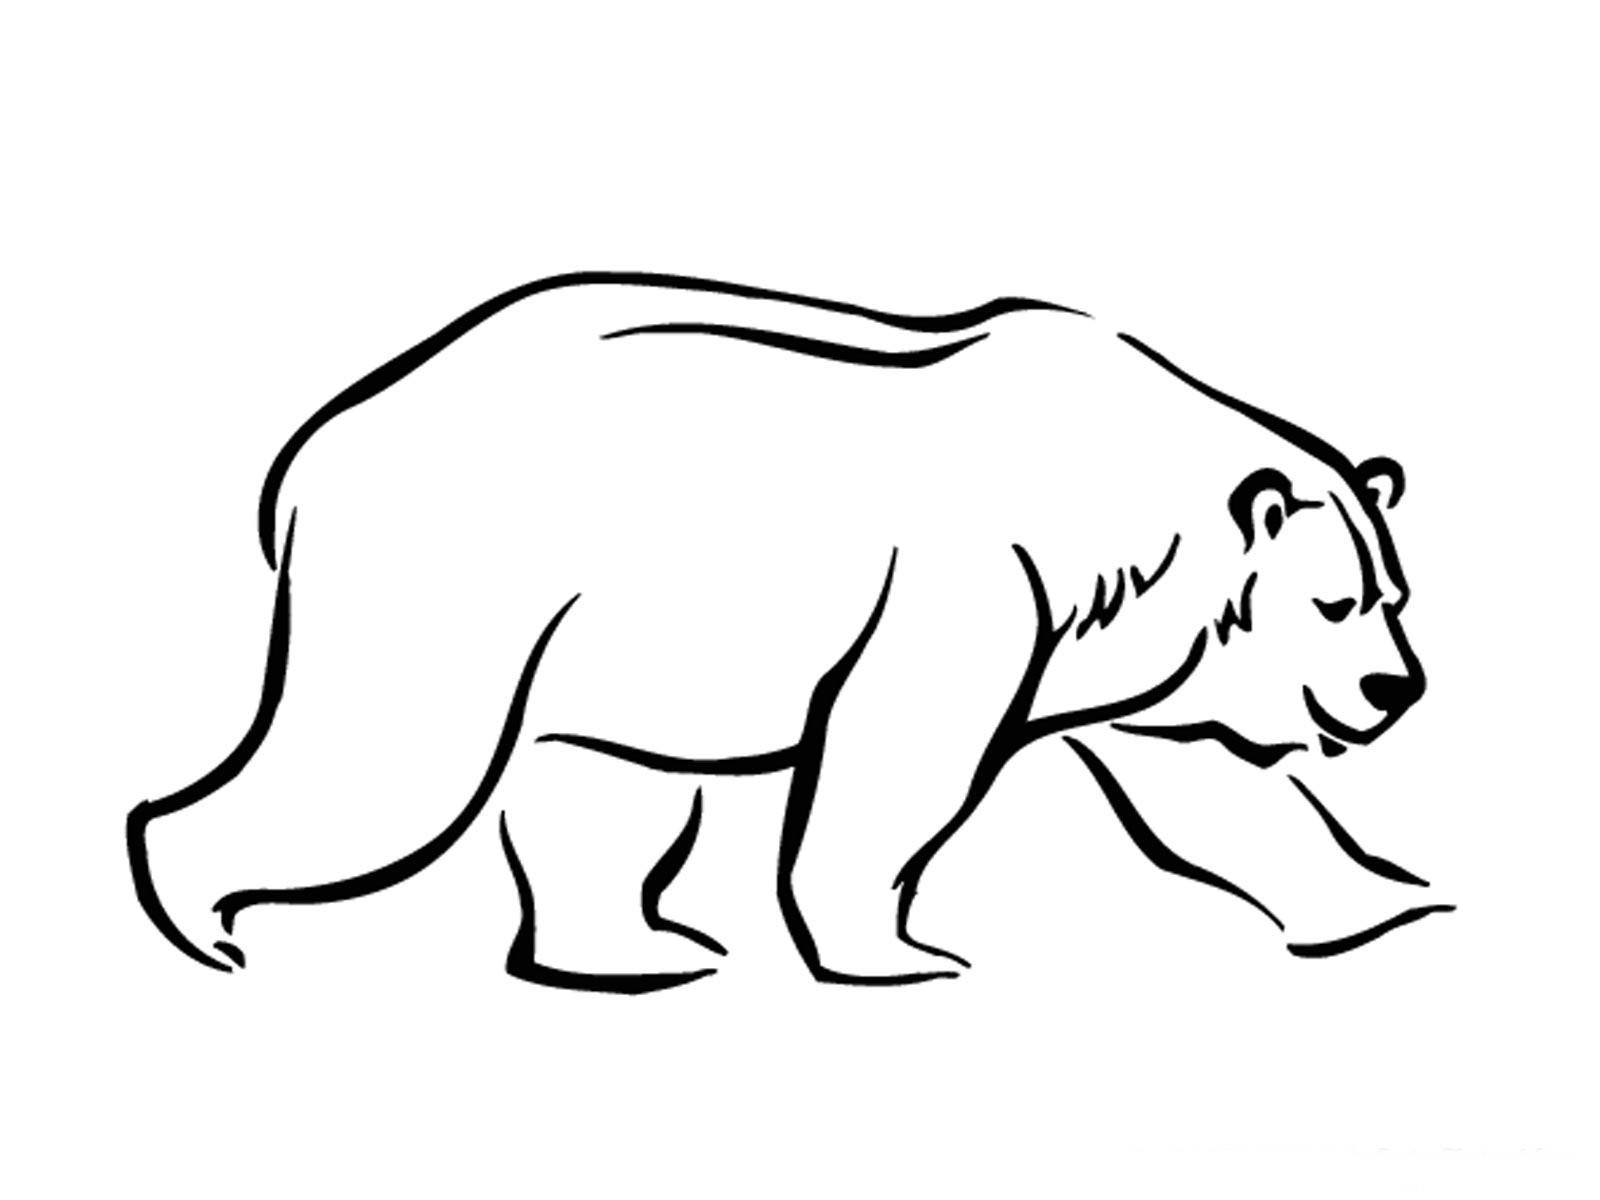 1600x1200 Coca Cola Stencil Free Printable Free Printable Polar Bear